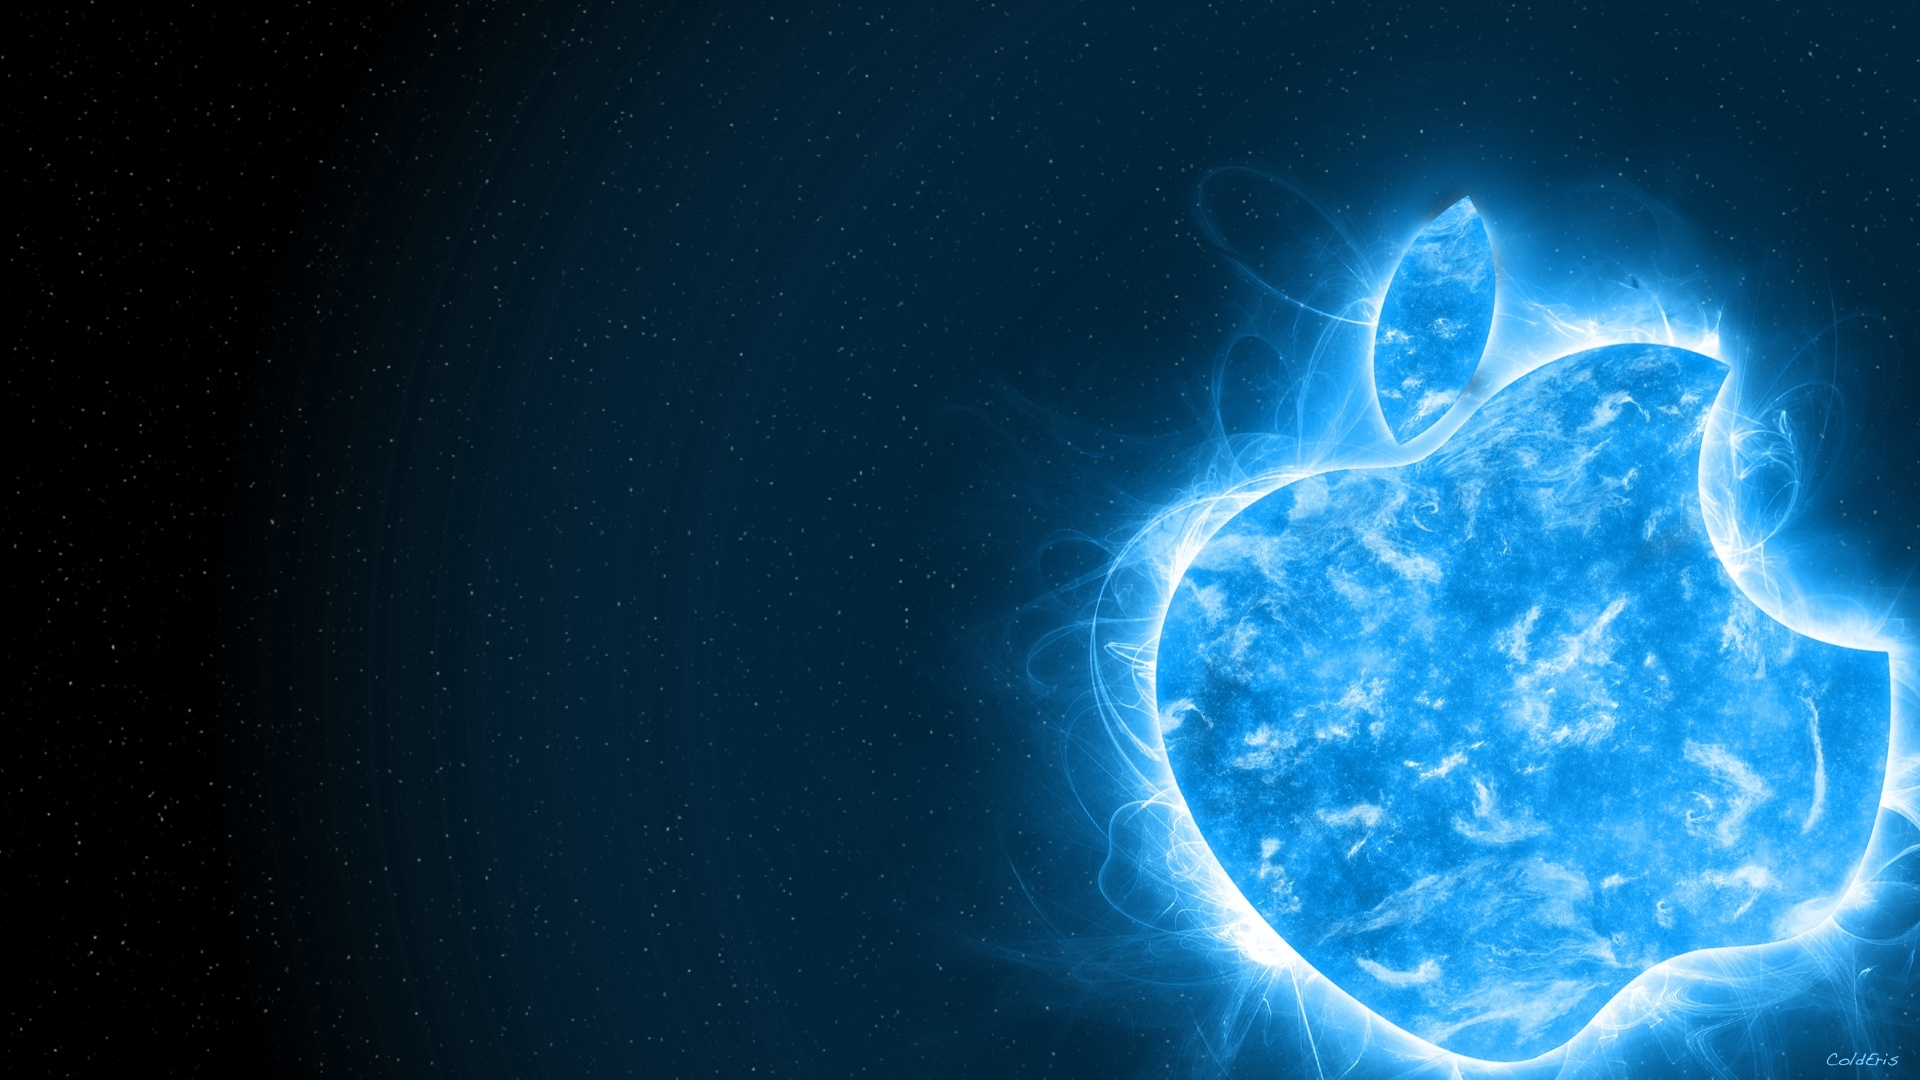 Blue Sunshine Apple Full HD Desktop Wallpapers 1080p 1920x1080